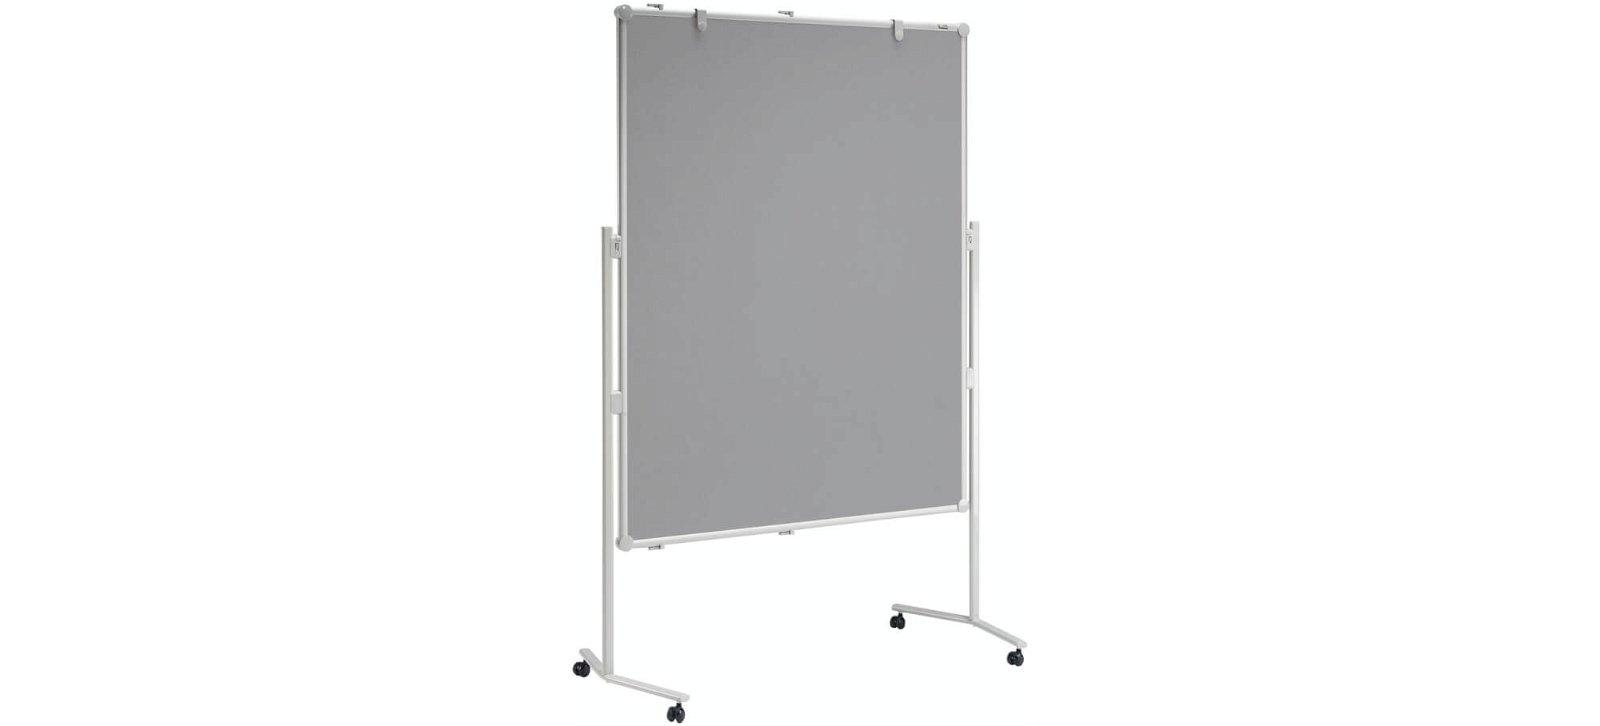 Moderationstafel MAULpro Textil grau, 150x120 cm, grau